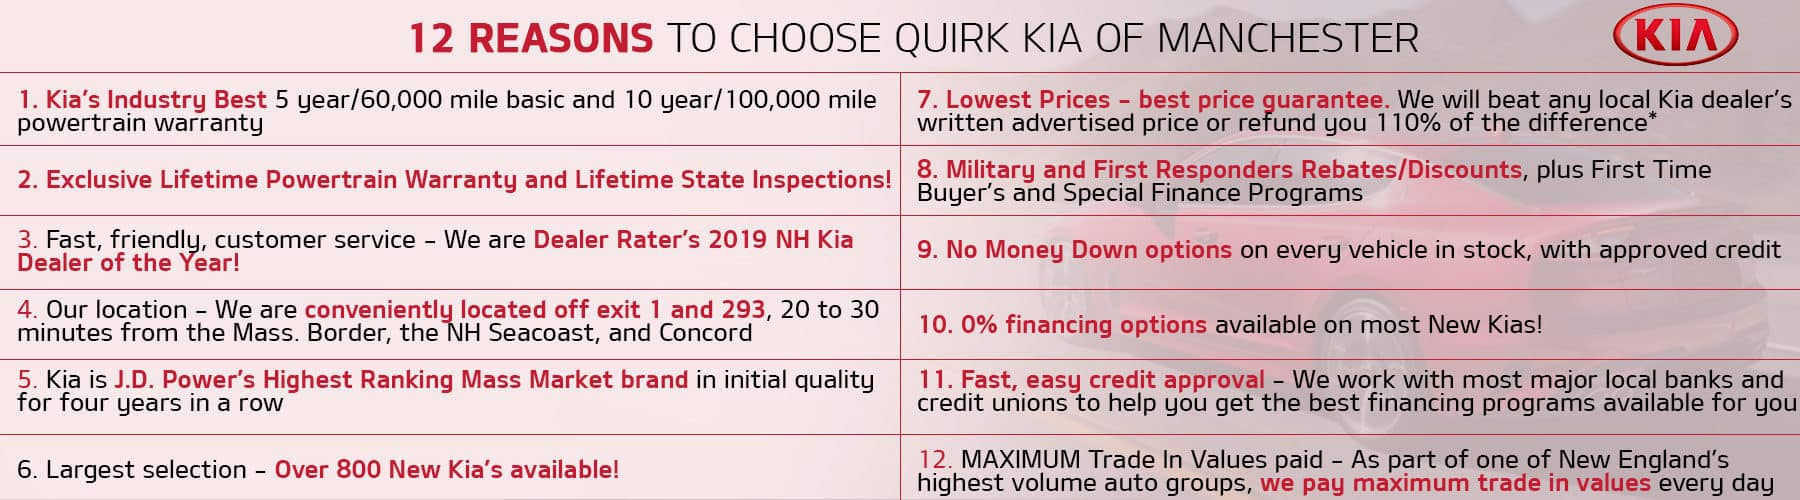 12 Reasons to Choose Quirk Kia!